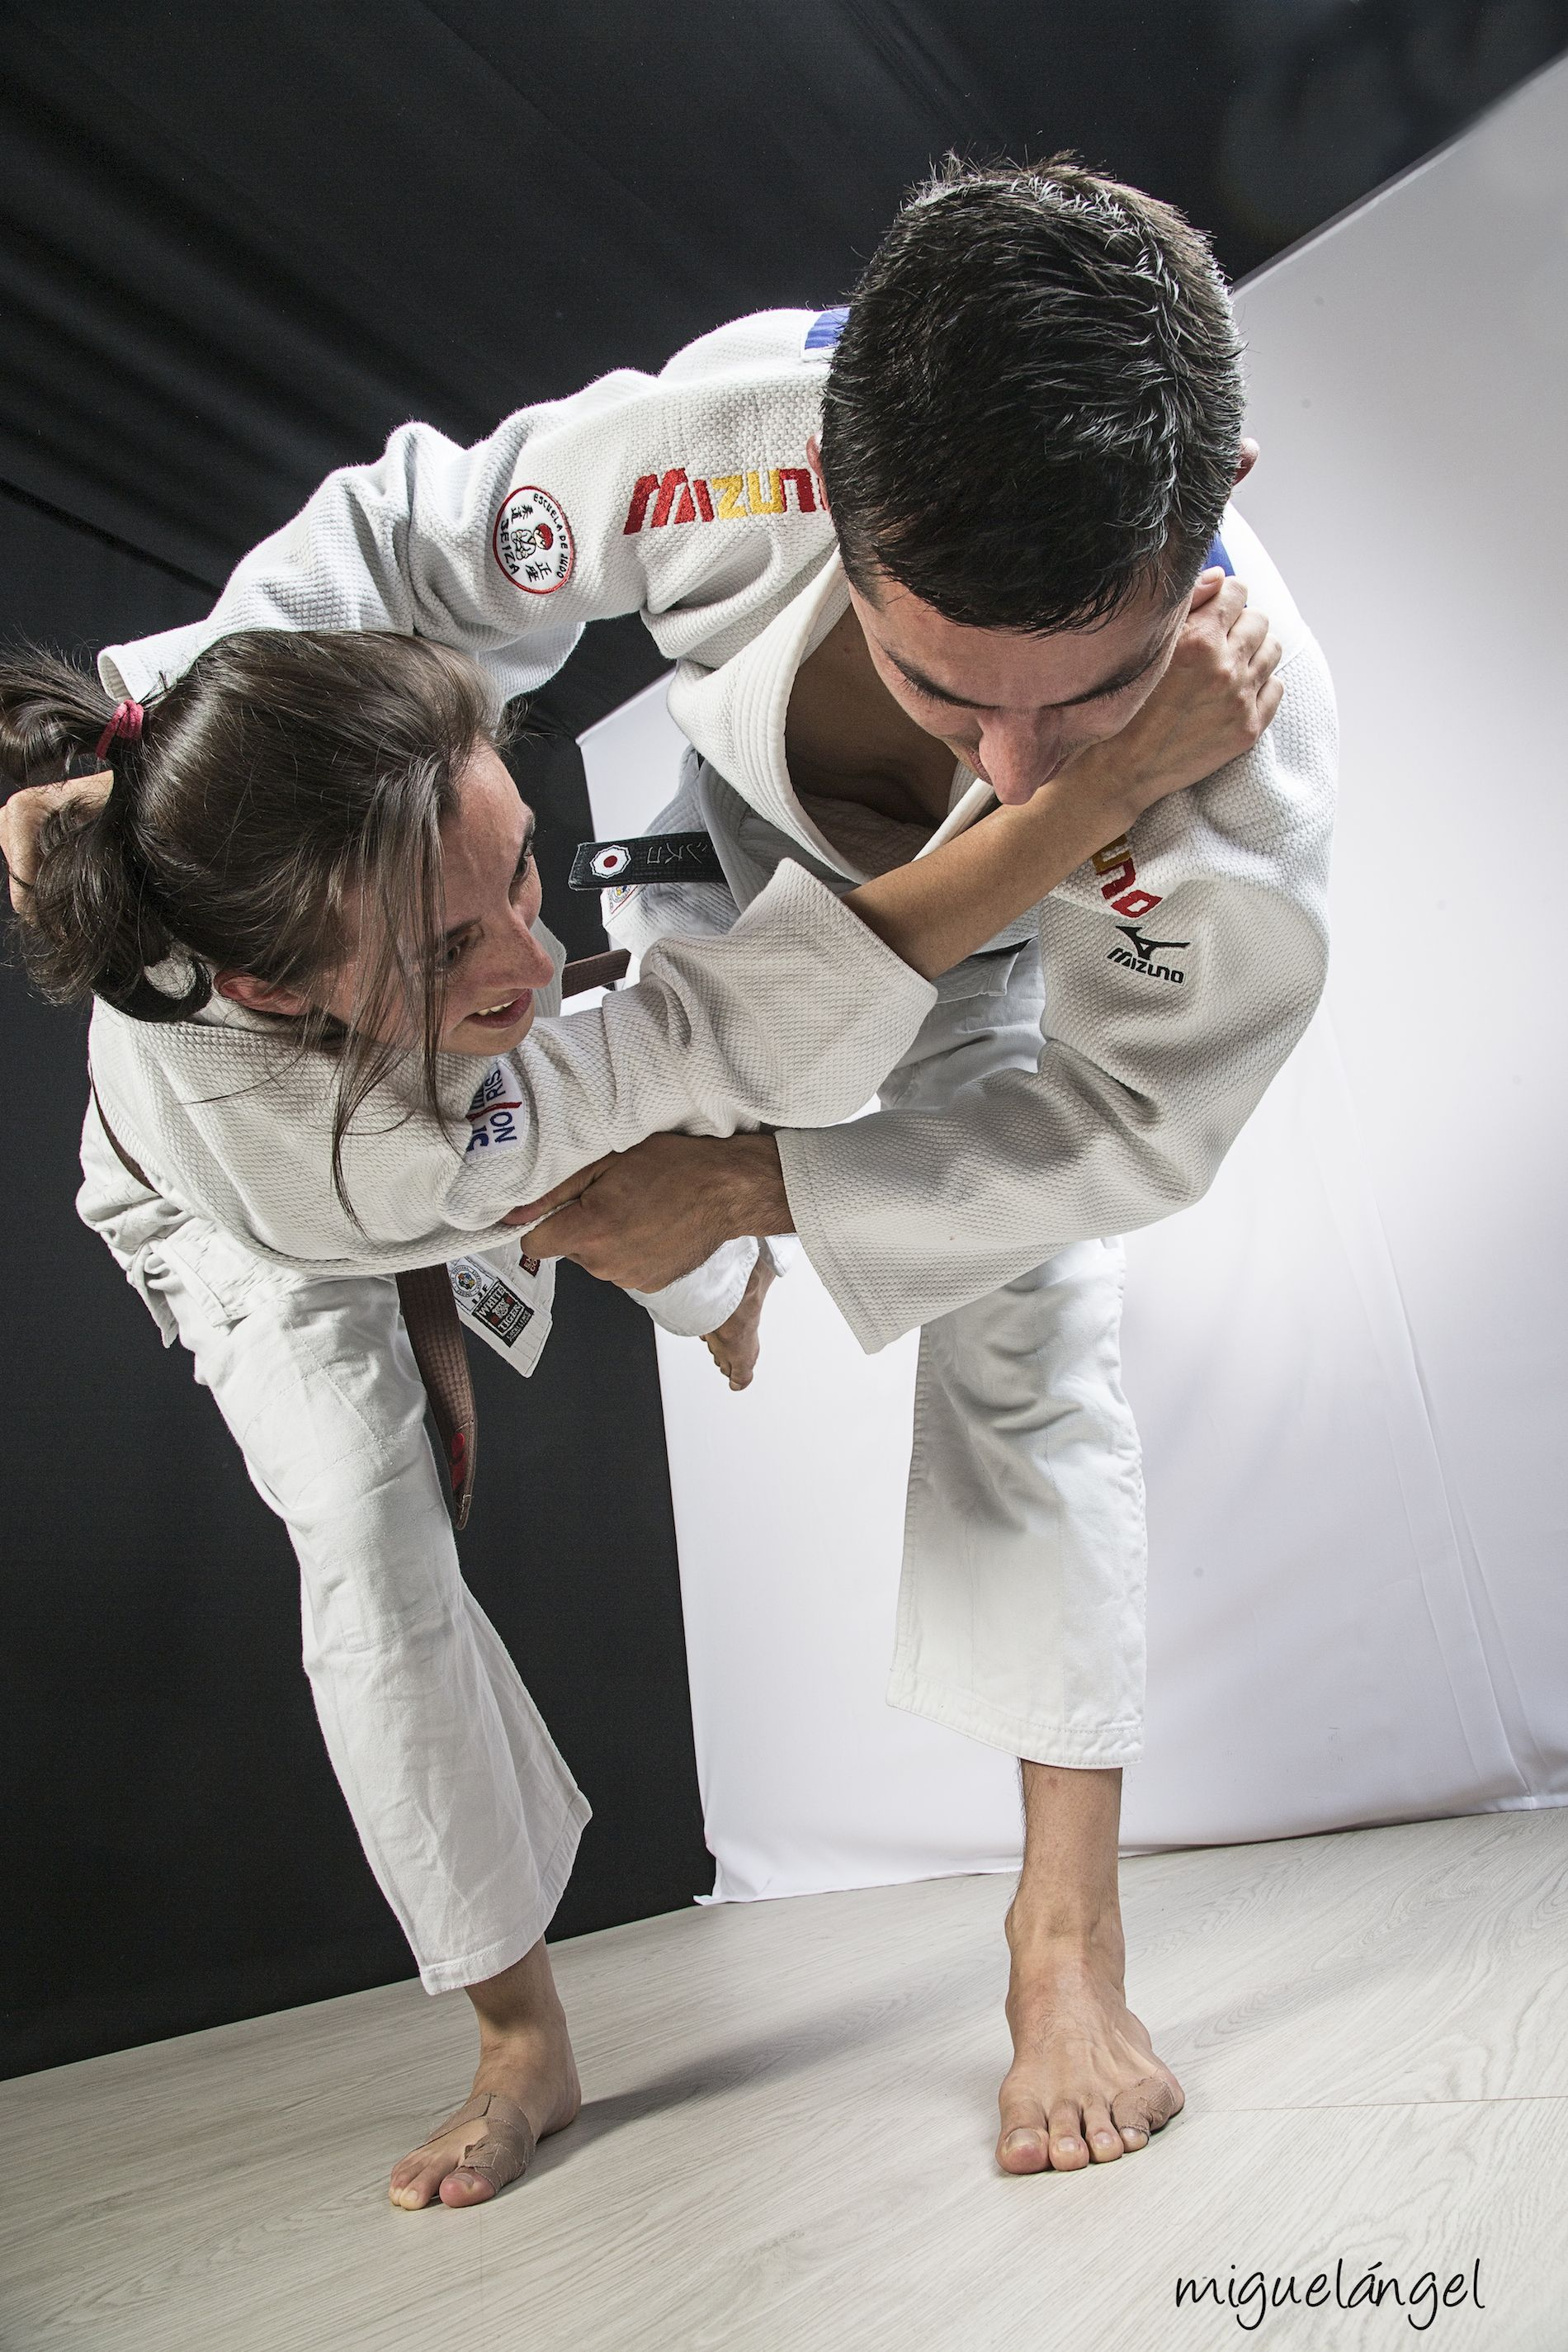 Pin de Matheus Signori en Martial arts   Artes marciales